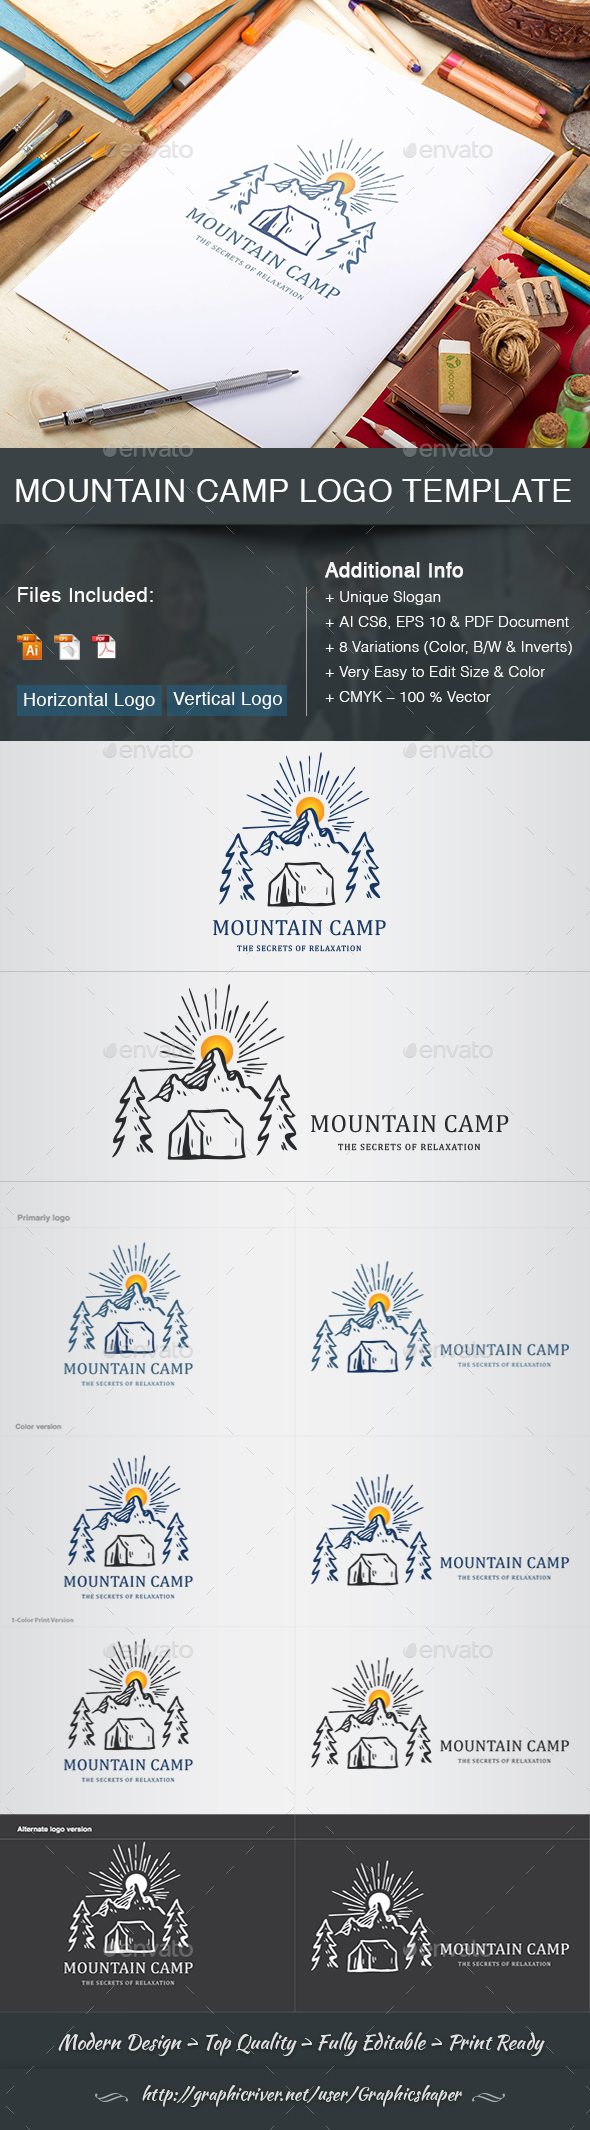 Mountain Camp Logo Template - Nature Logo Templates